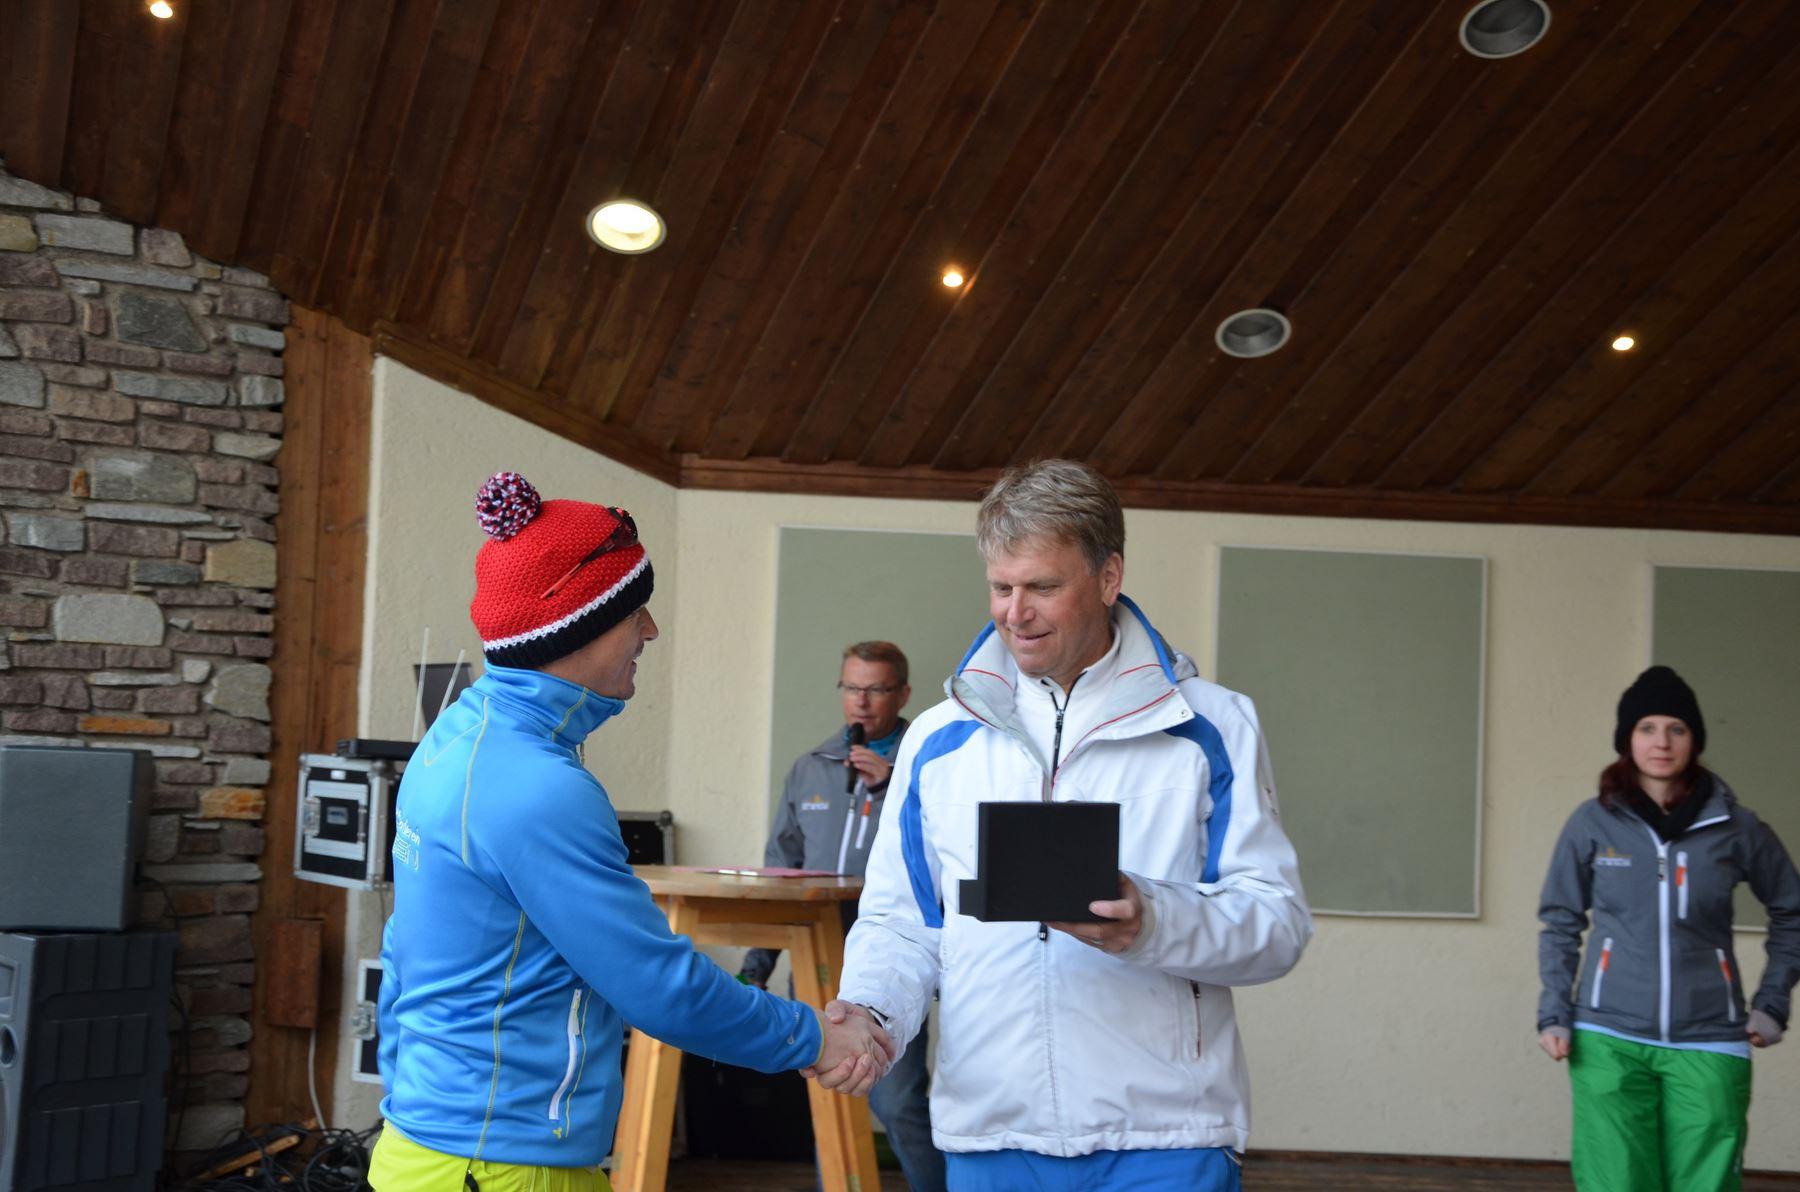 2015-03-22 BV Zillertal Skirennen 465.JPG